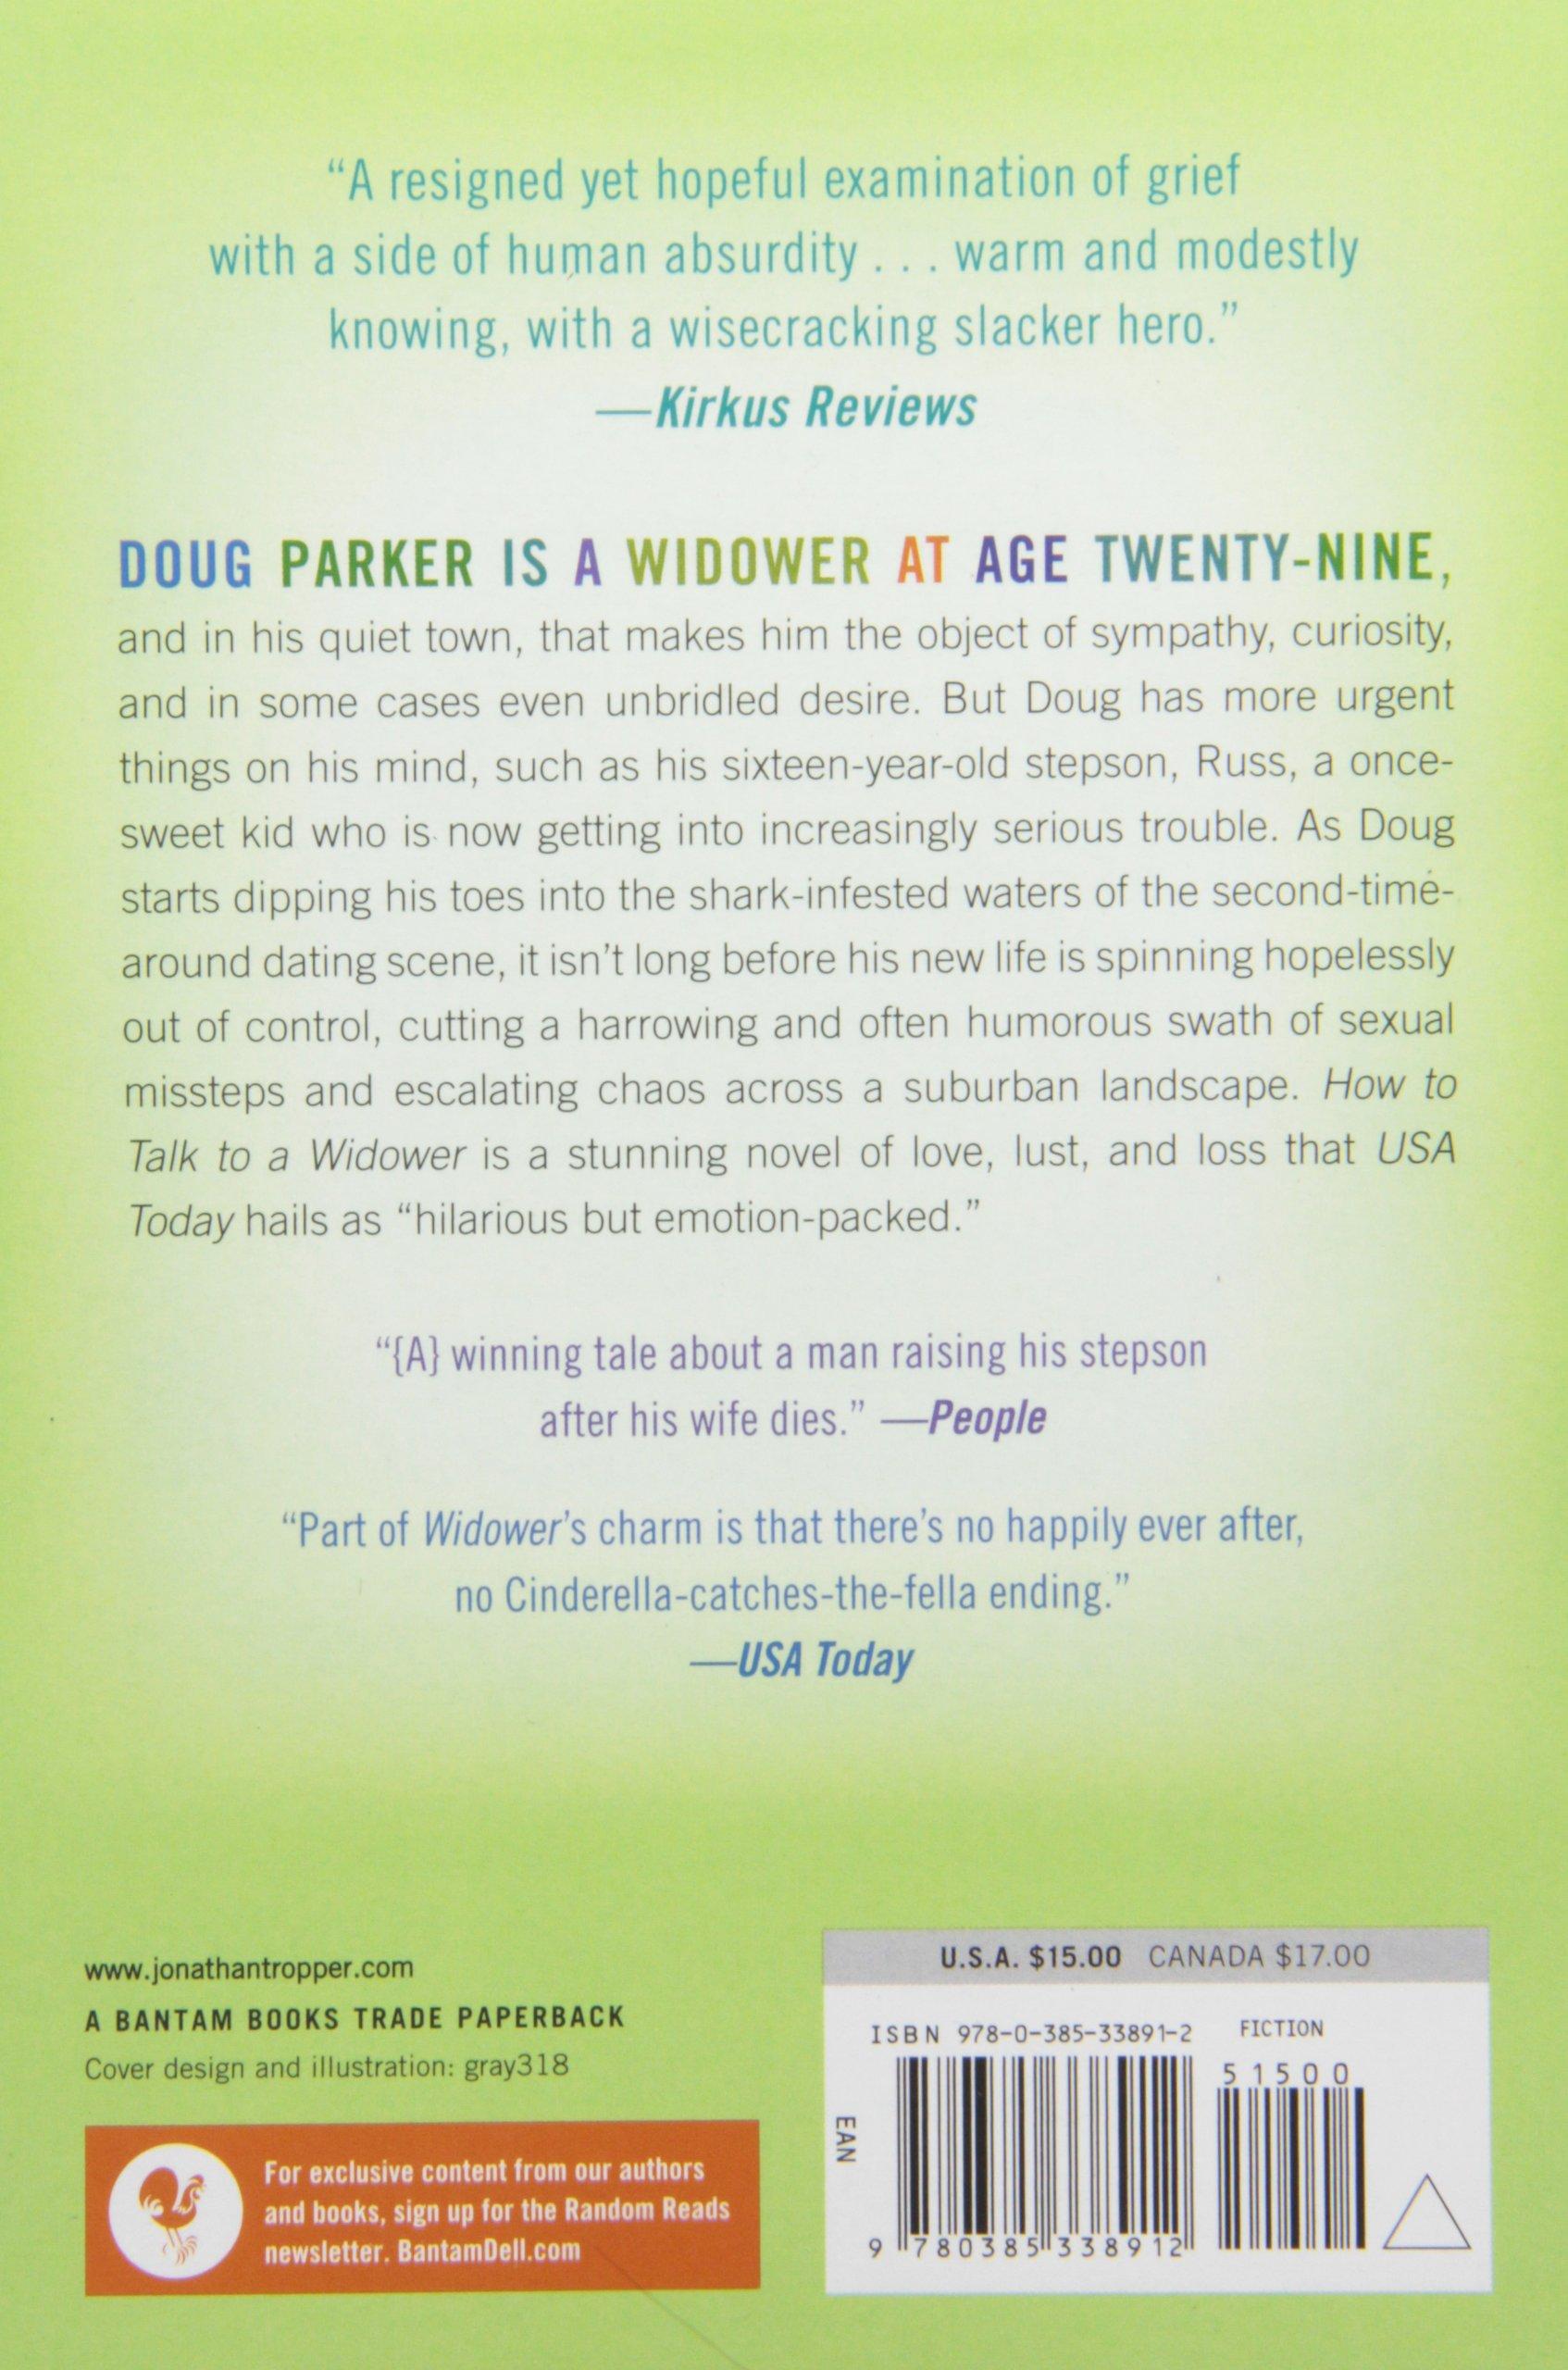 How To Talk To A Widower: A Novel (bantam Discovery): Jonathan Tropper:  9780385338912: Amazon: Books